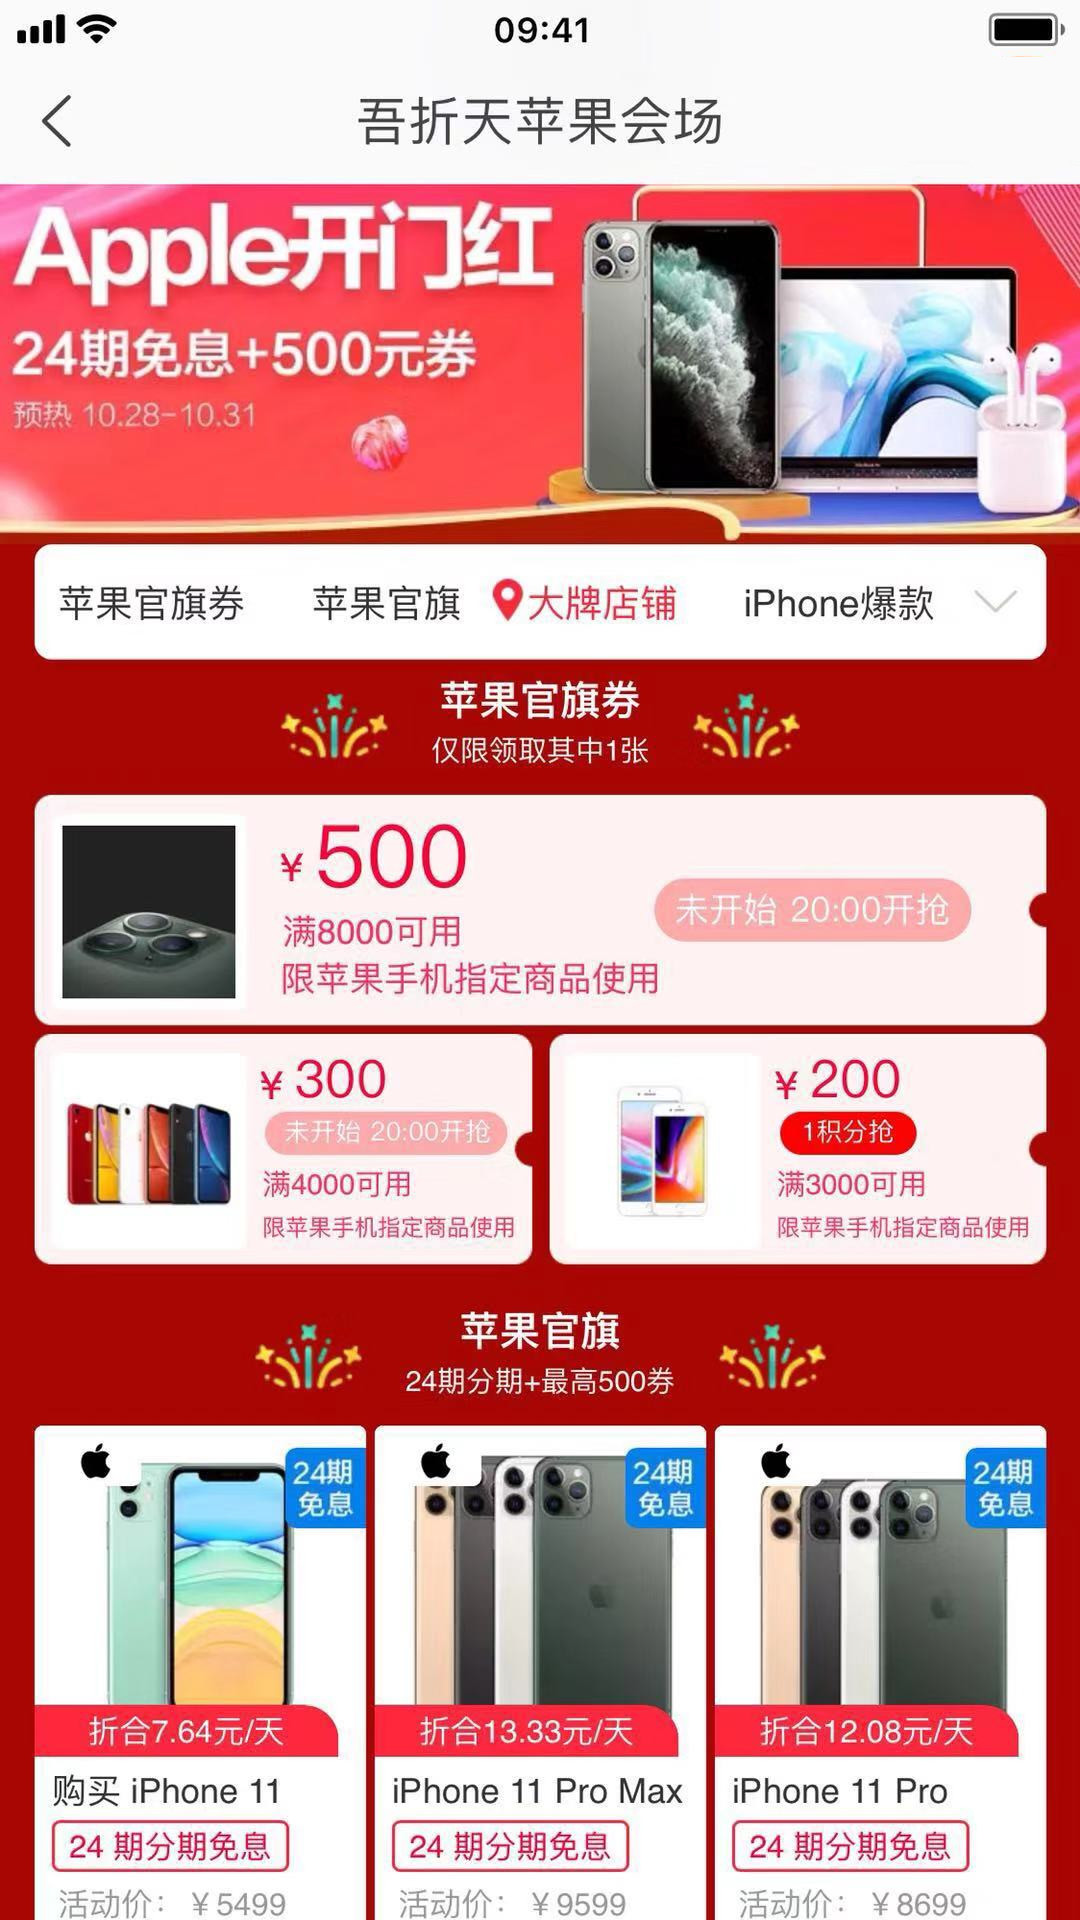 iPhone 11 官方首次降价,领券最高减 500 元